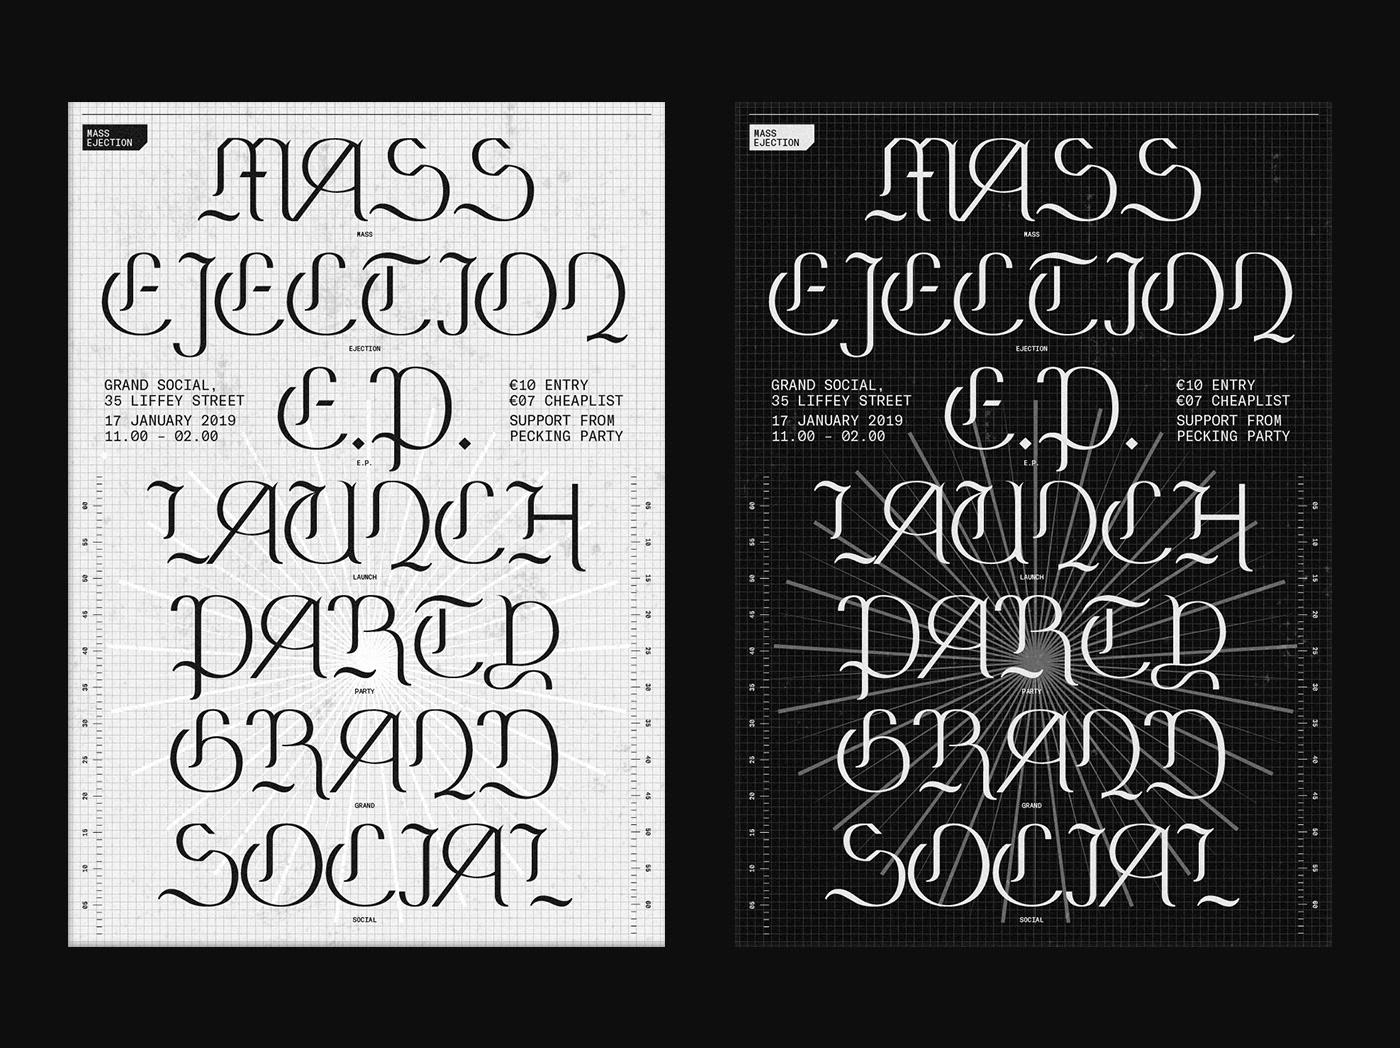 vinyl motion graphics  Packaging Album design graphic design  typography   album cover art direction  branding  Poster Design